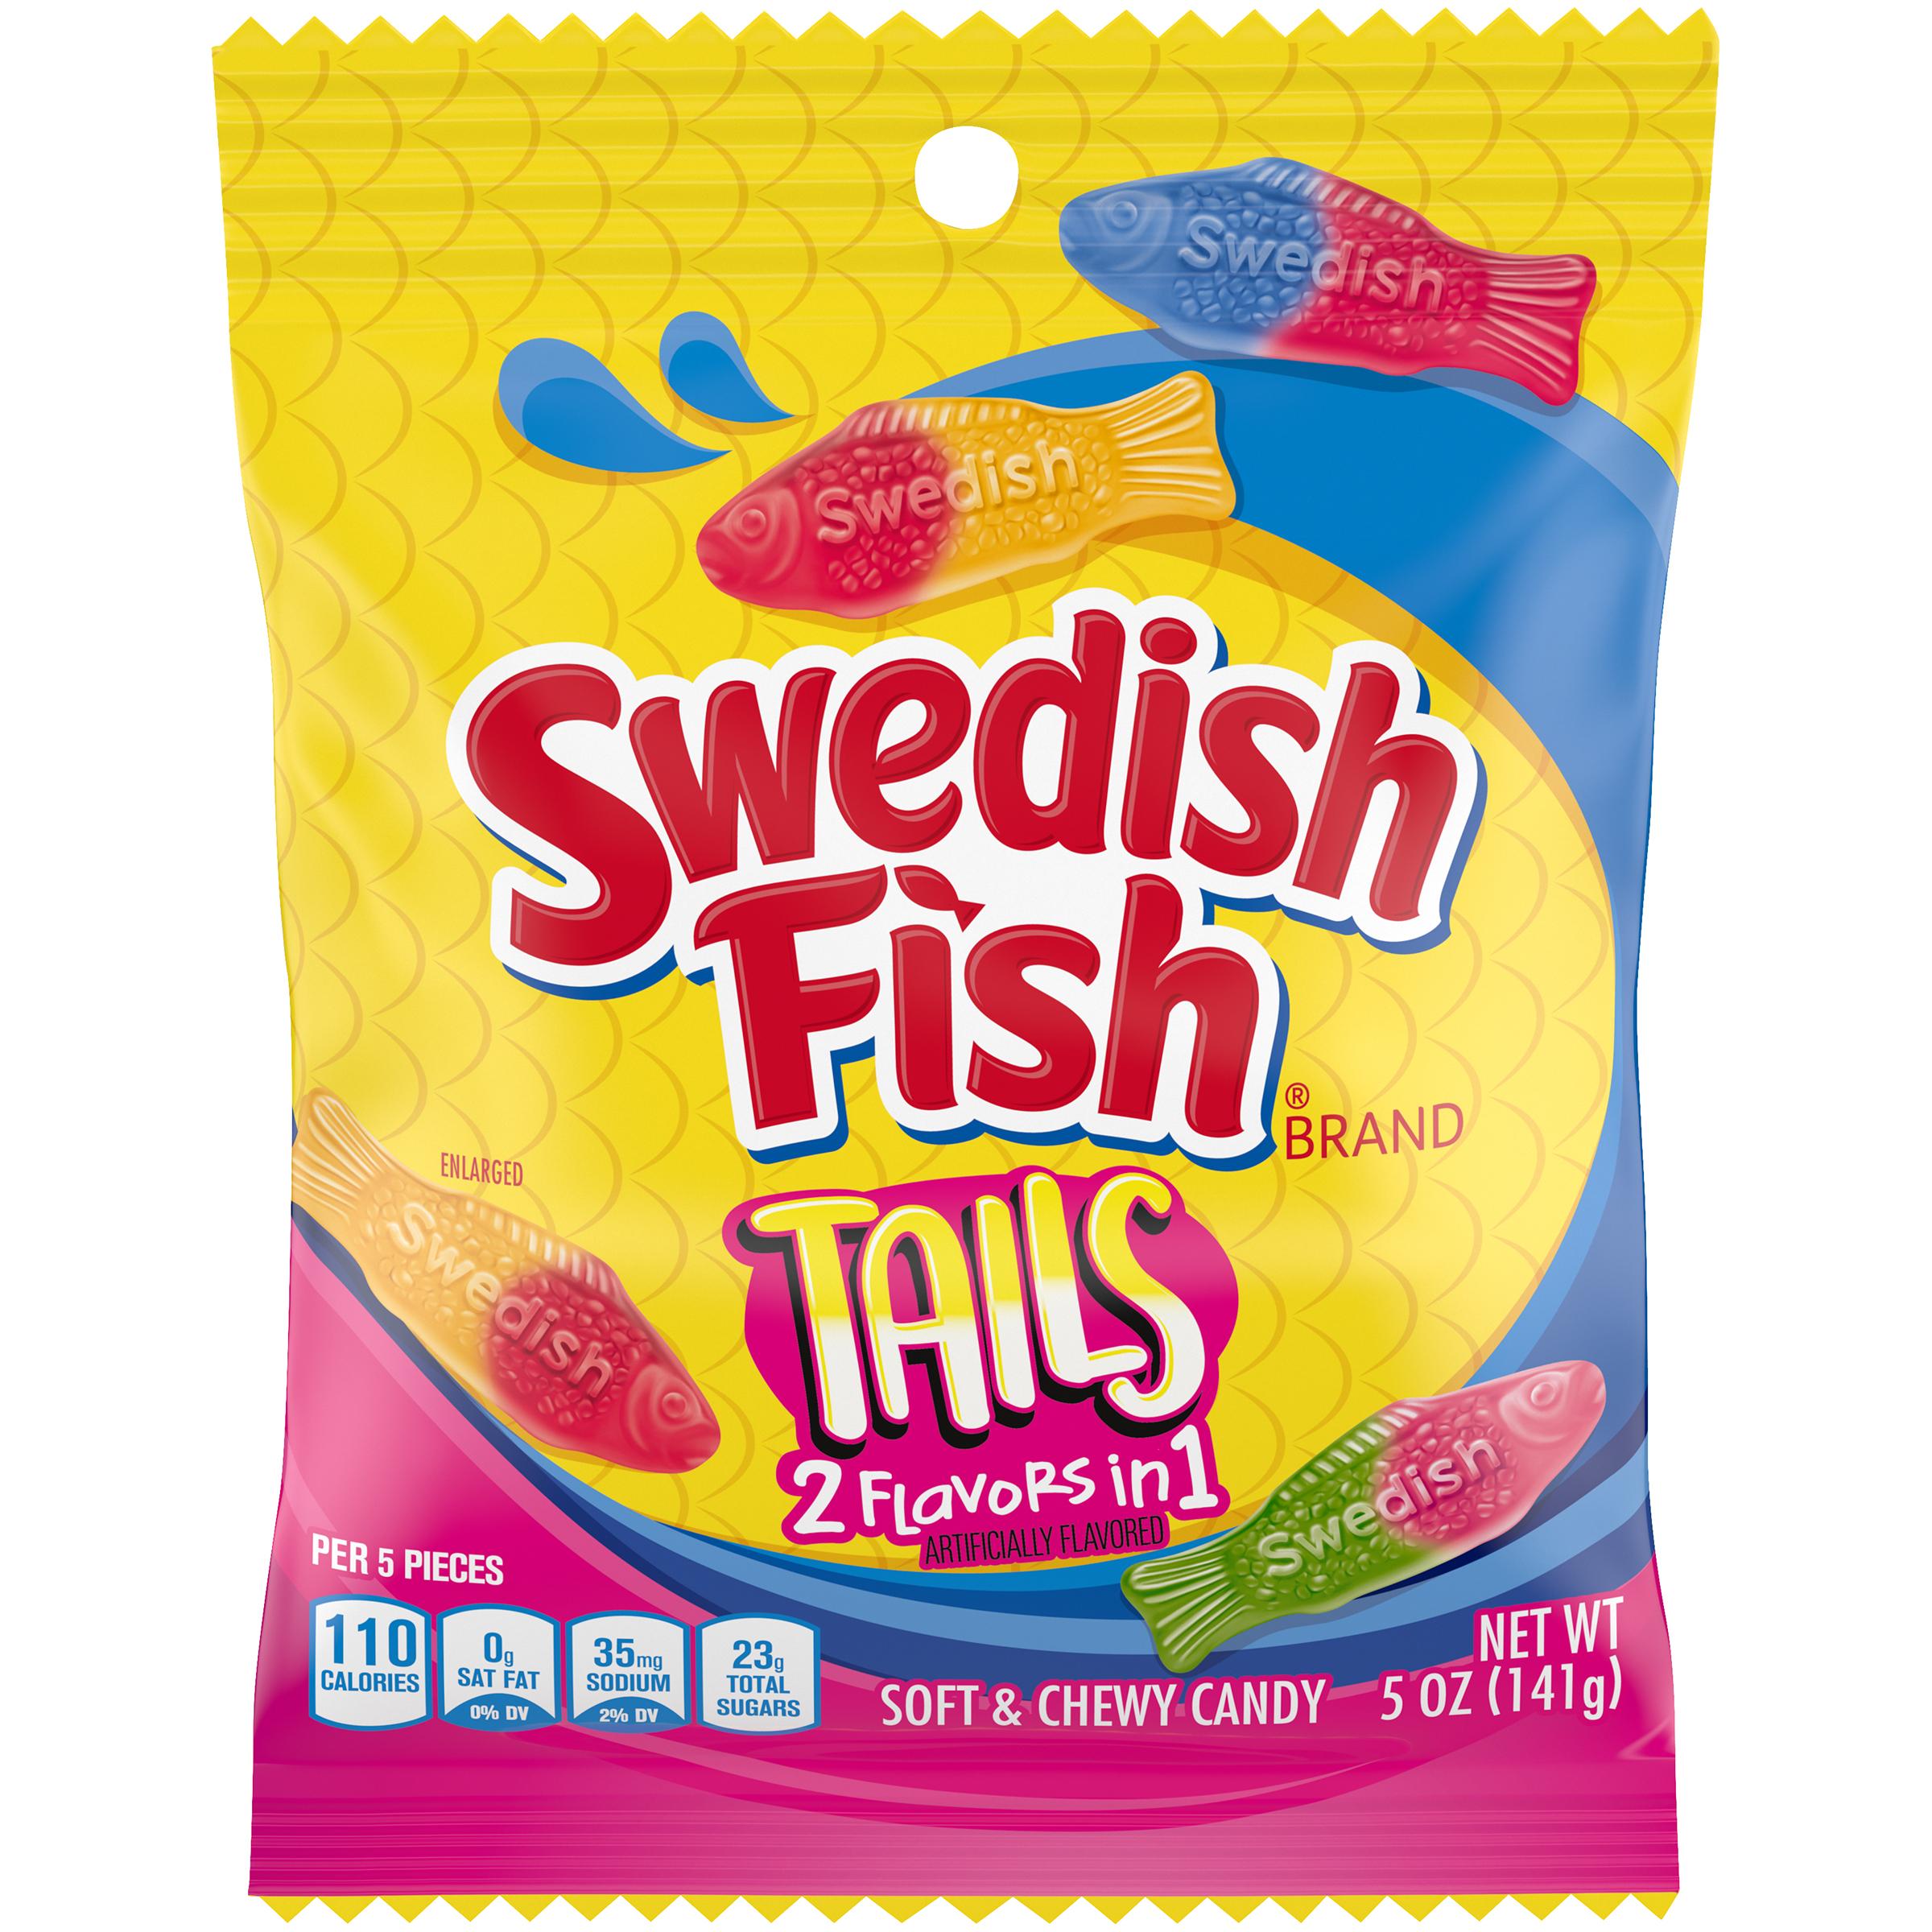 SWEDISH FISH Tails Tails Soft Candy 5 oz